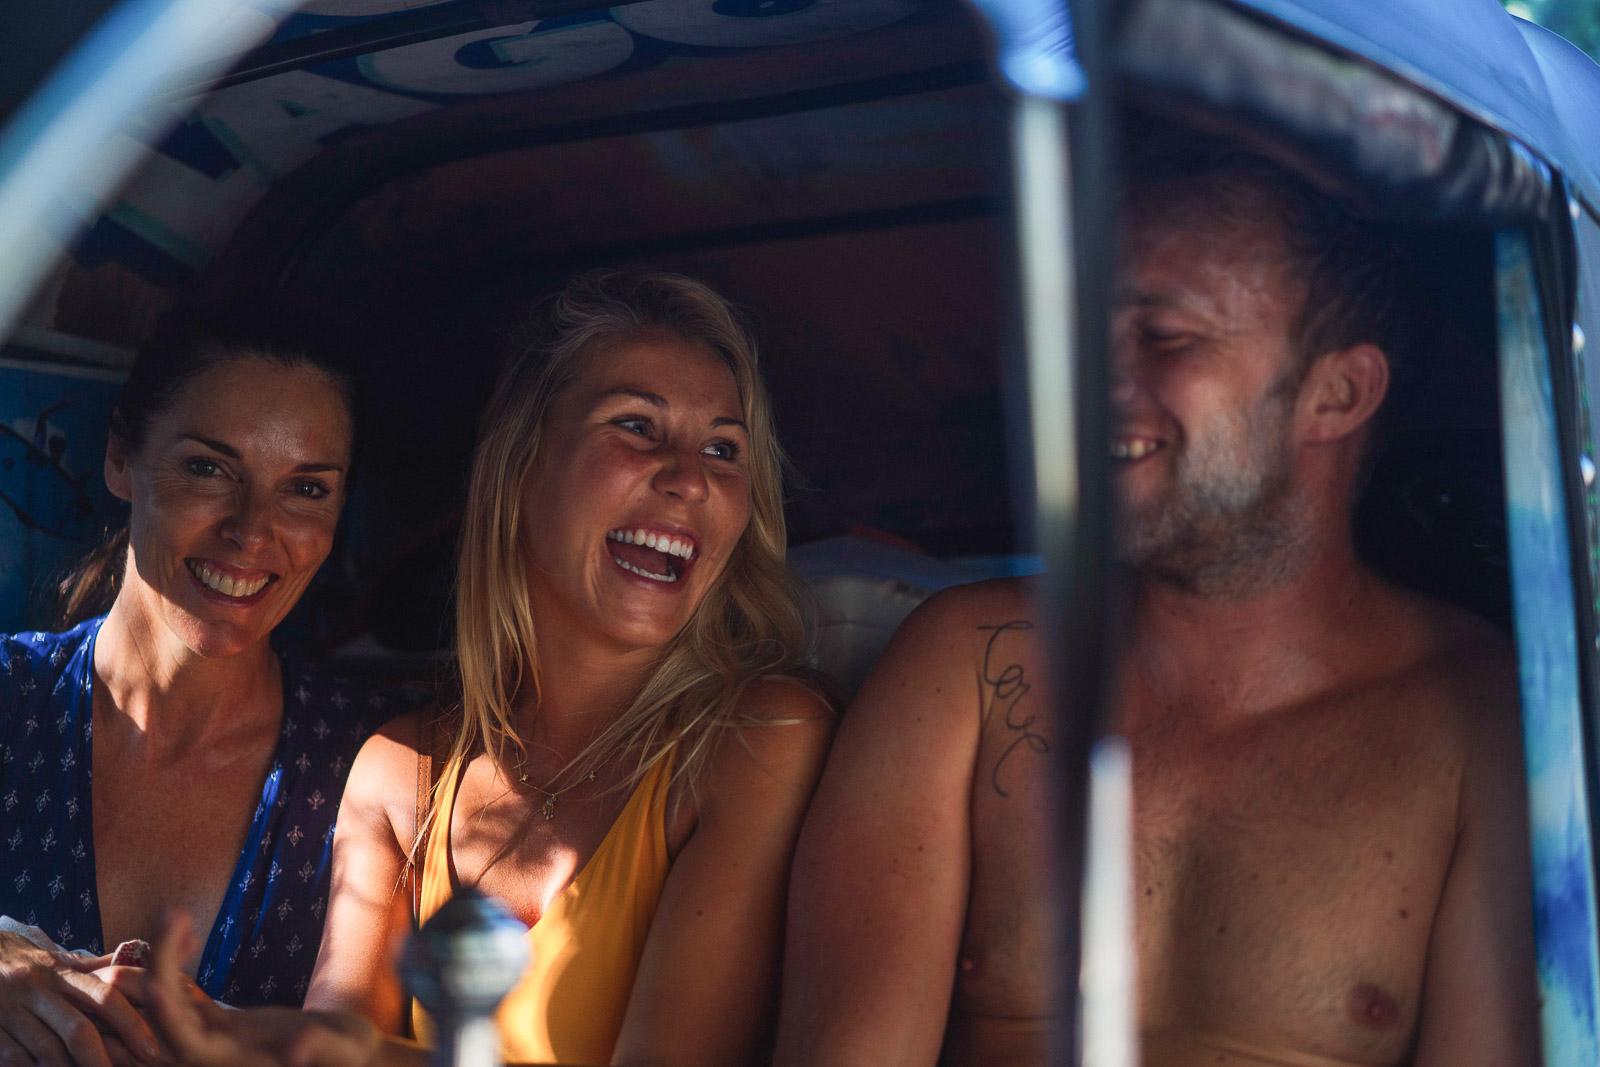 Sunshinestories-surf-travel-blog-8am2